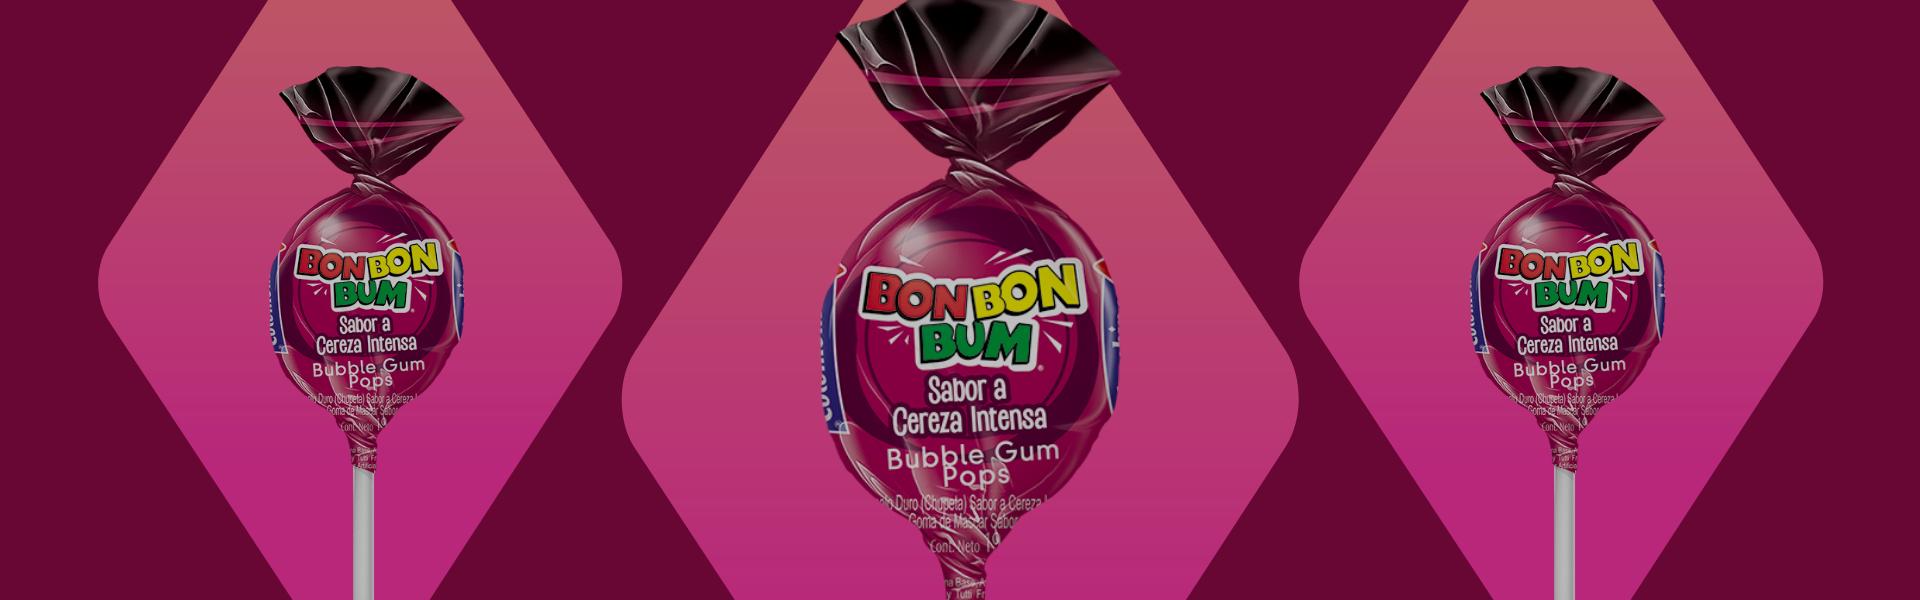 Histórico logro de Bon Bon Bum: ahora se venderá en Walmart en Estados Unidos